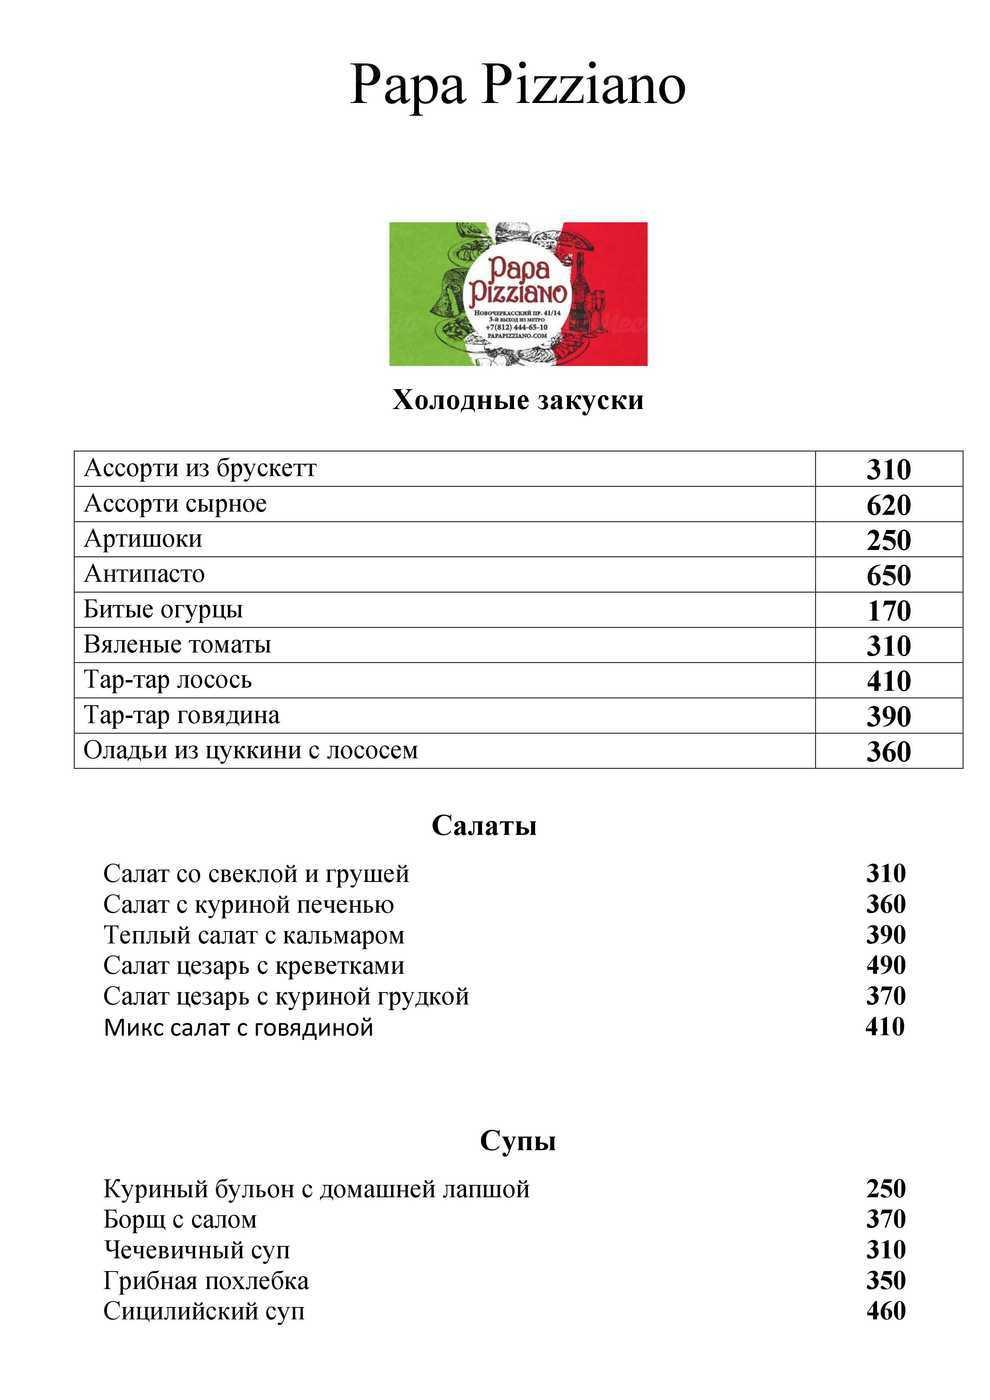 Меню ресторана Папа Пицциано (Papa Pizziano) на Новочеркасском проспекте фото 1